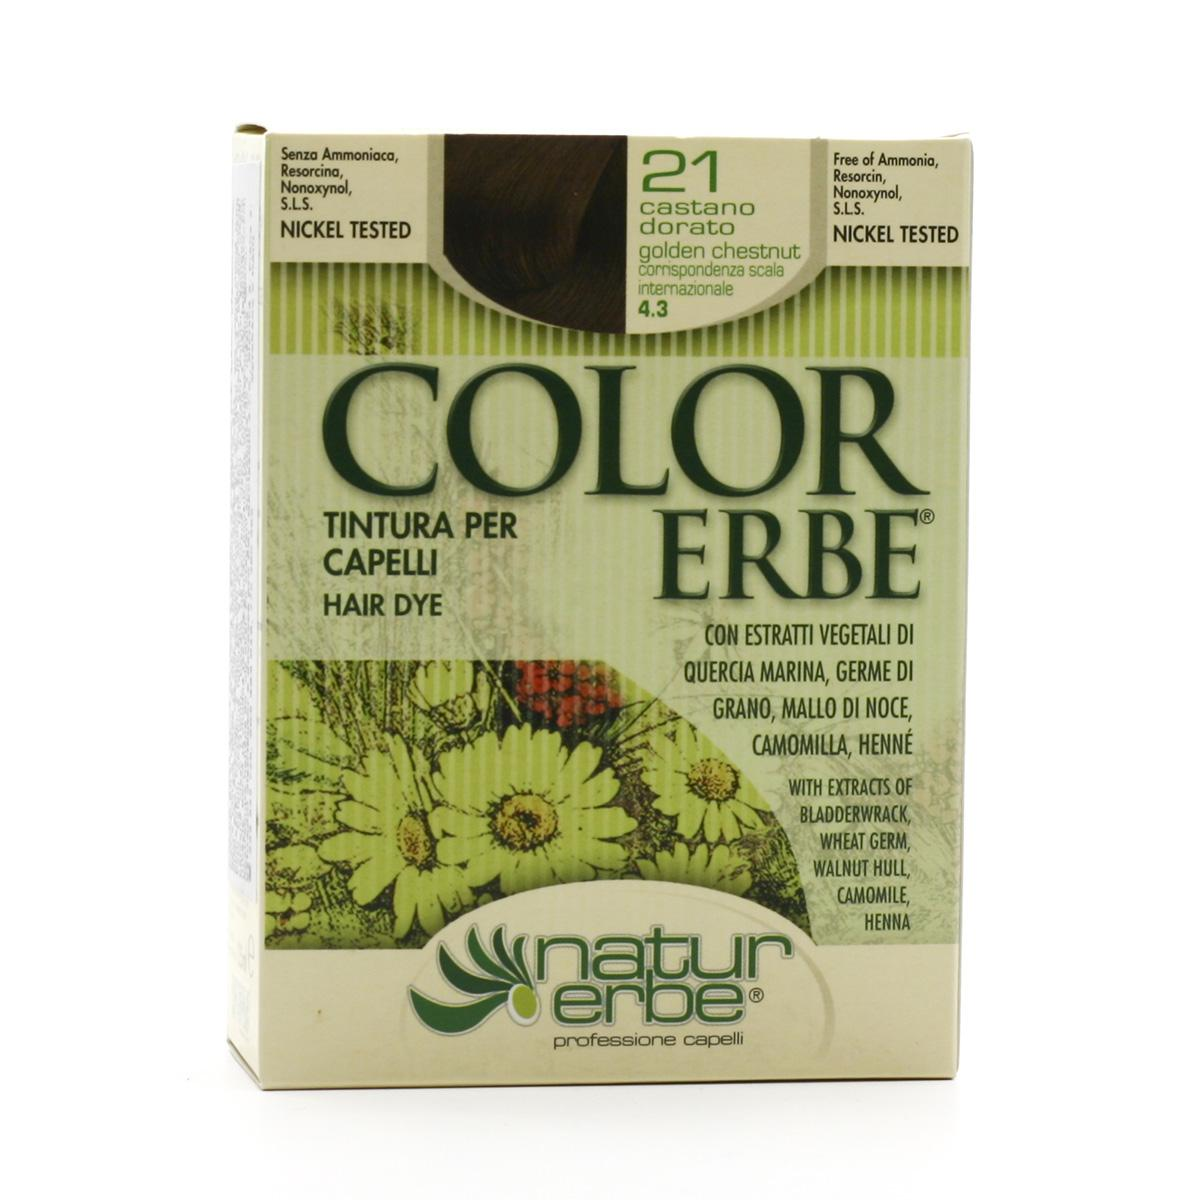 Color Erbe Barva na vlasy Zlatavě kaštanová 21, Natur 135 ml